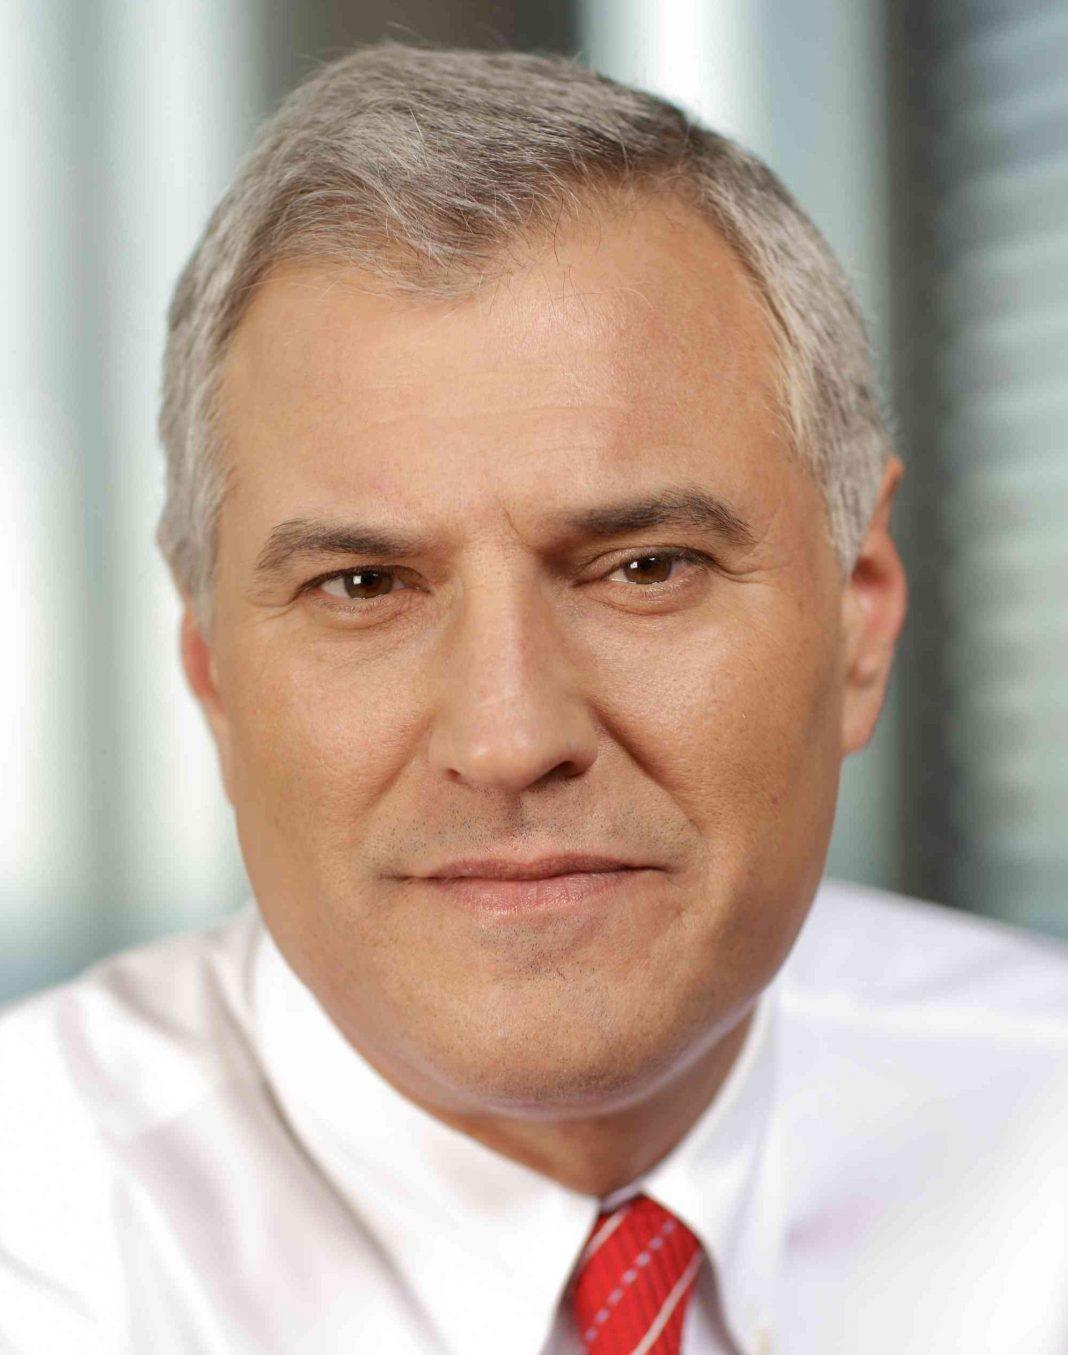 Lawrence A. Rosen, Deutsche Post DHL AG